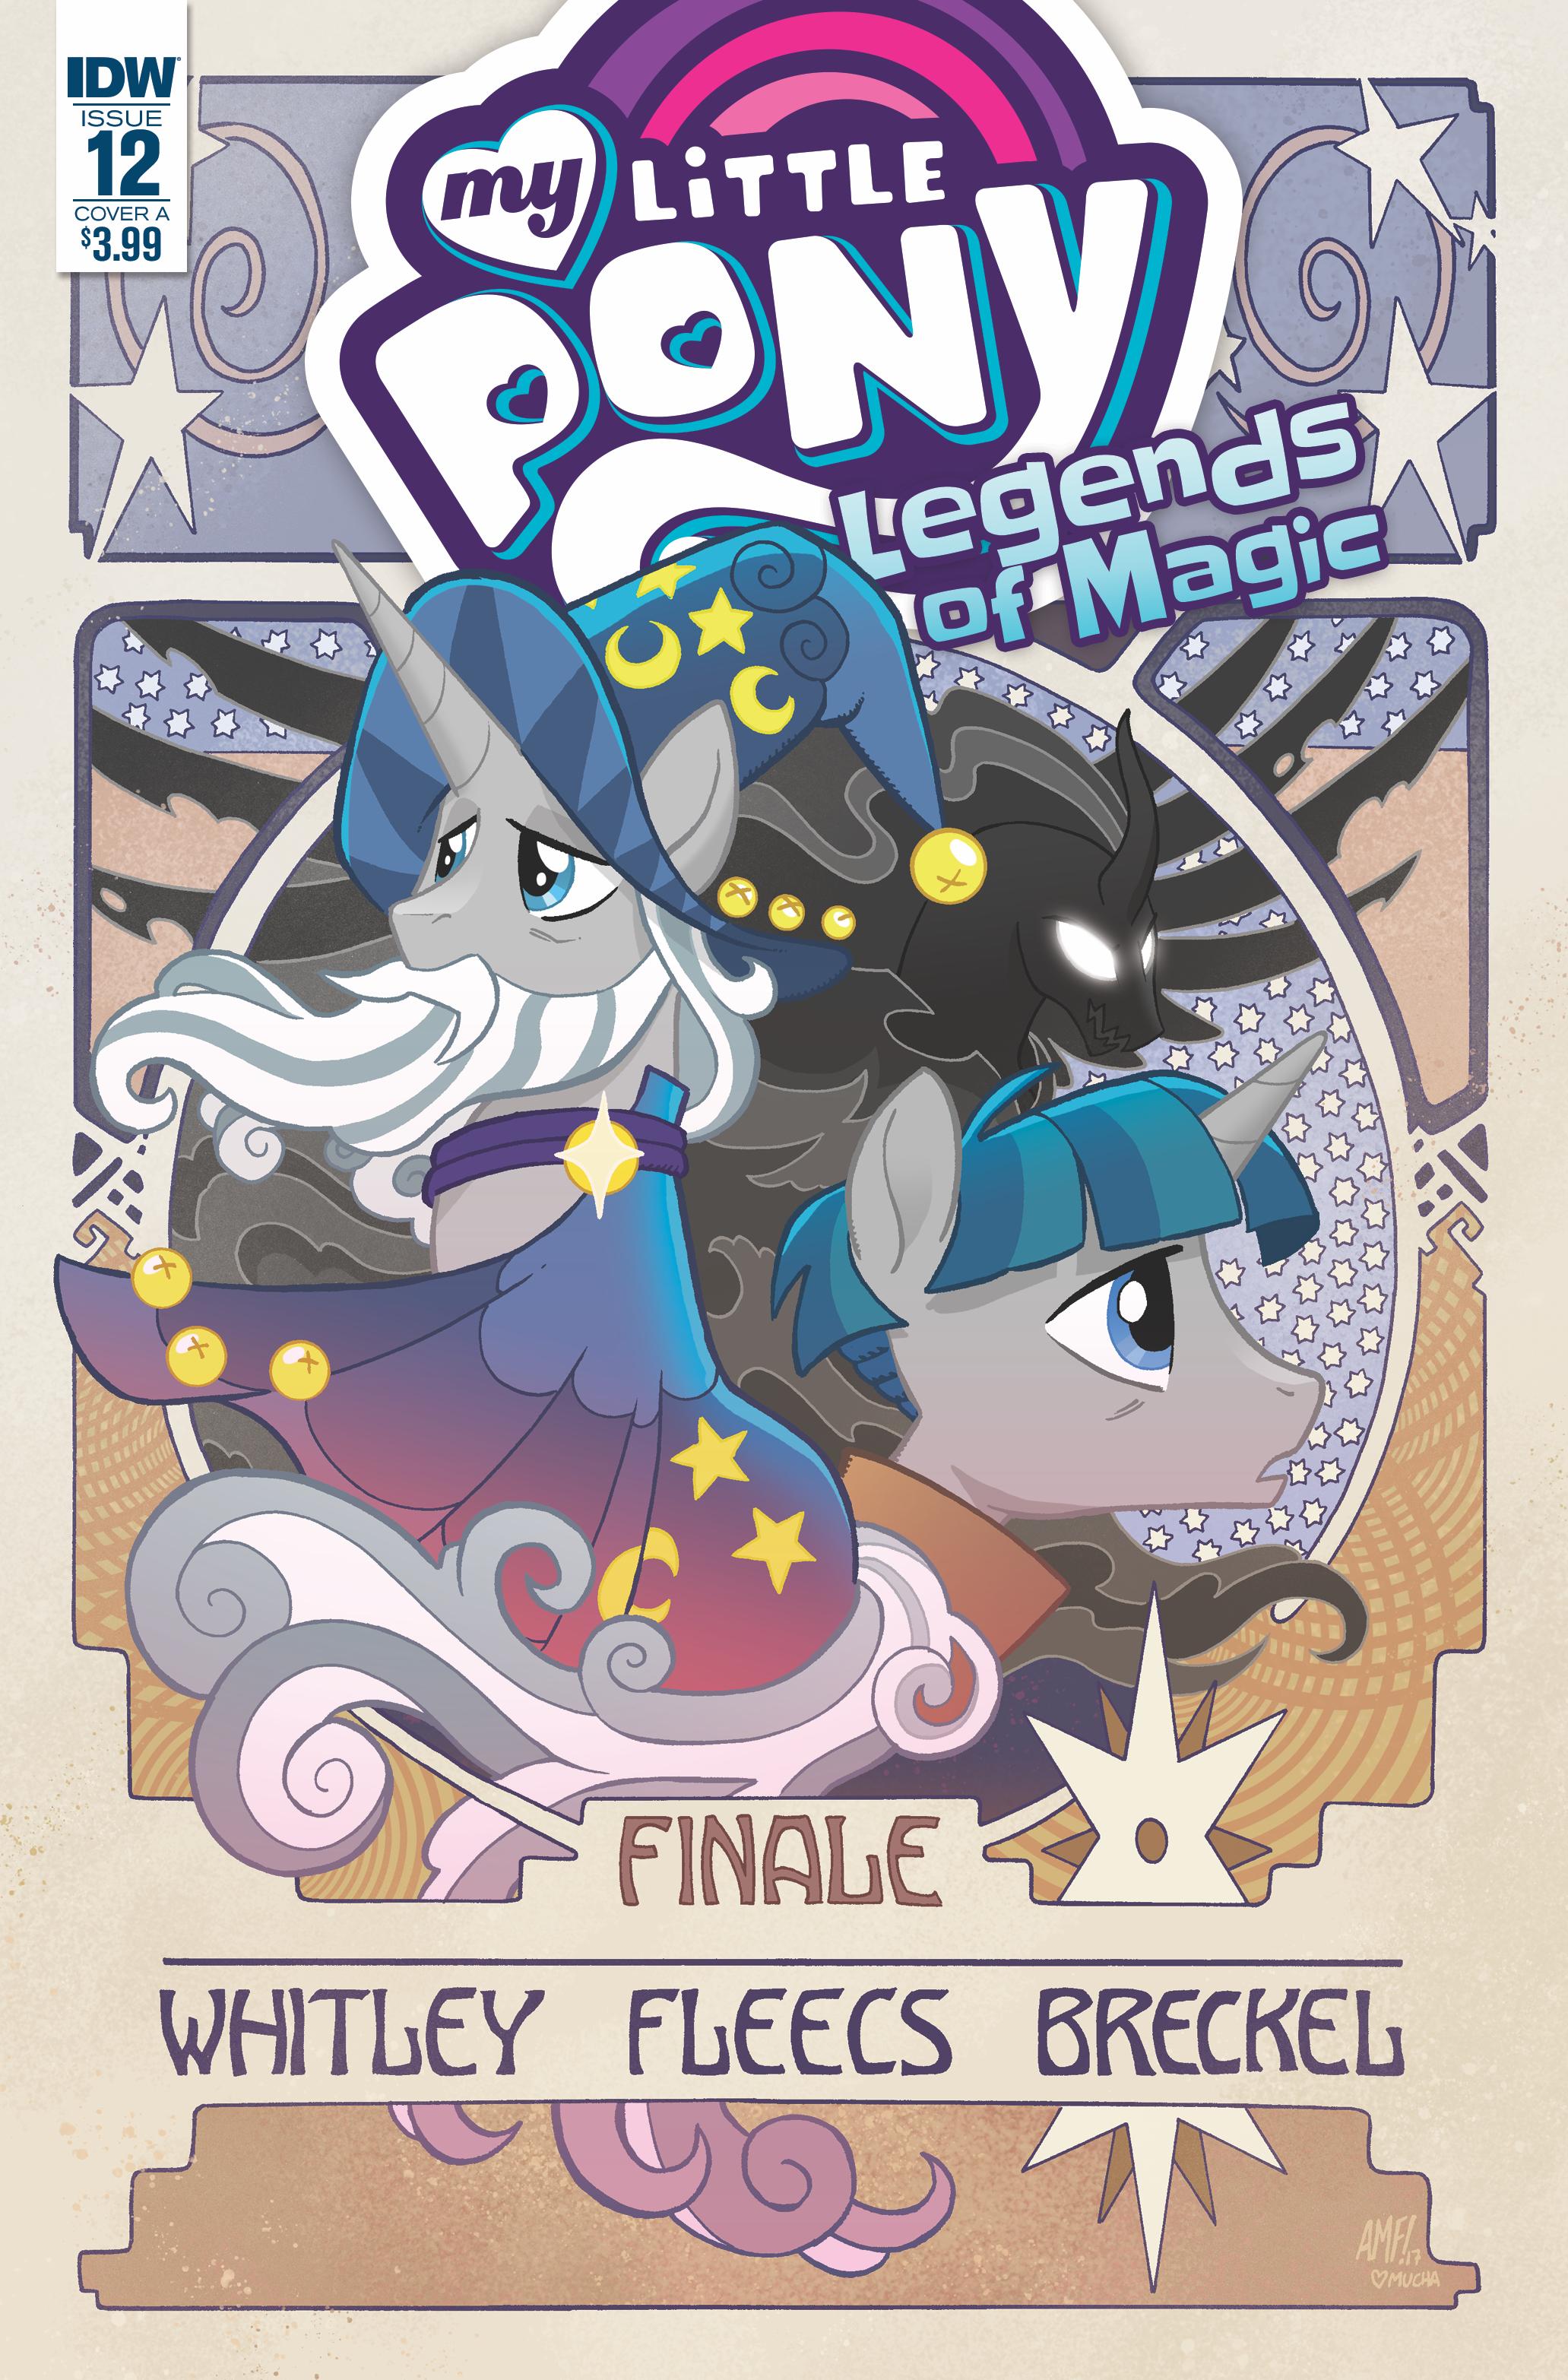 Legends of Magic Issue 12